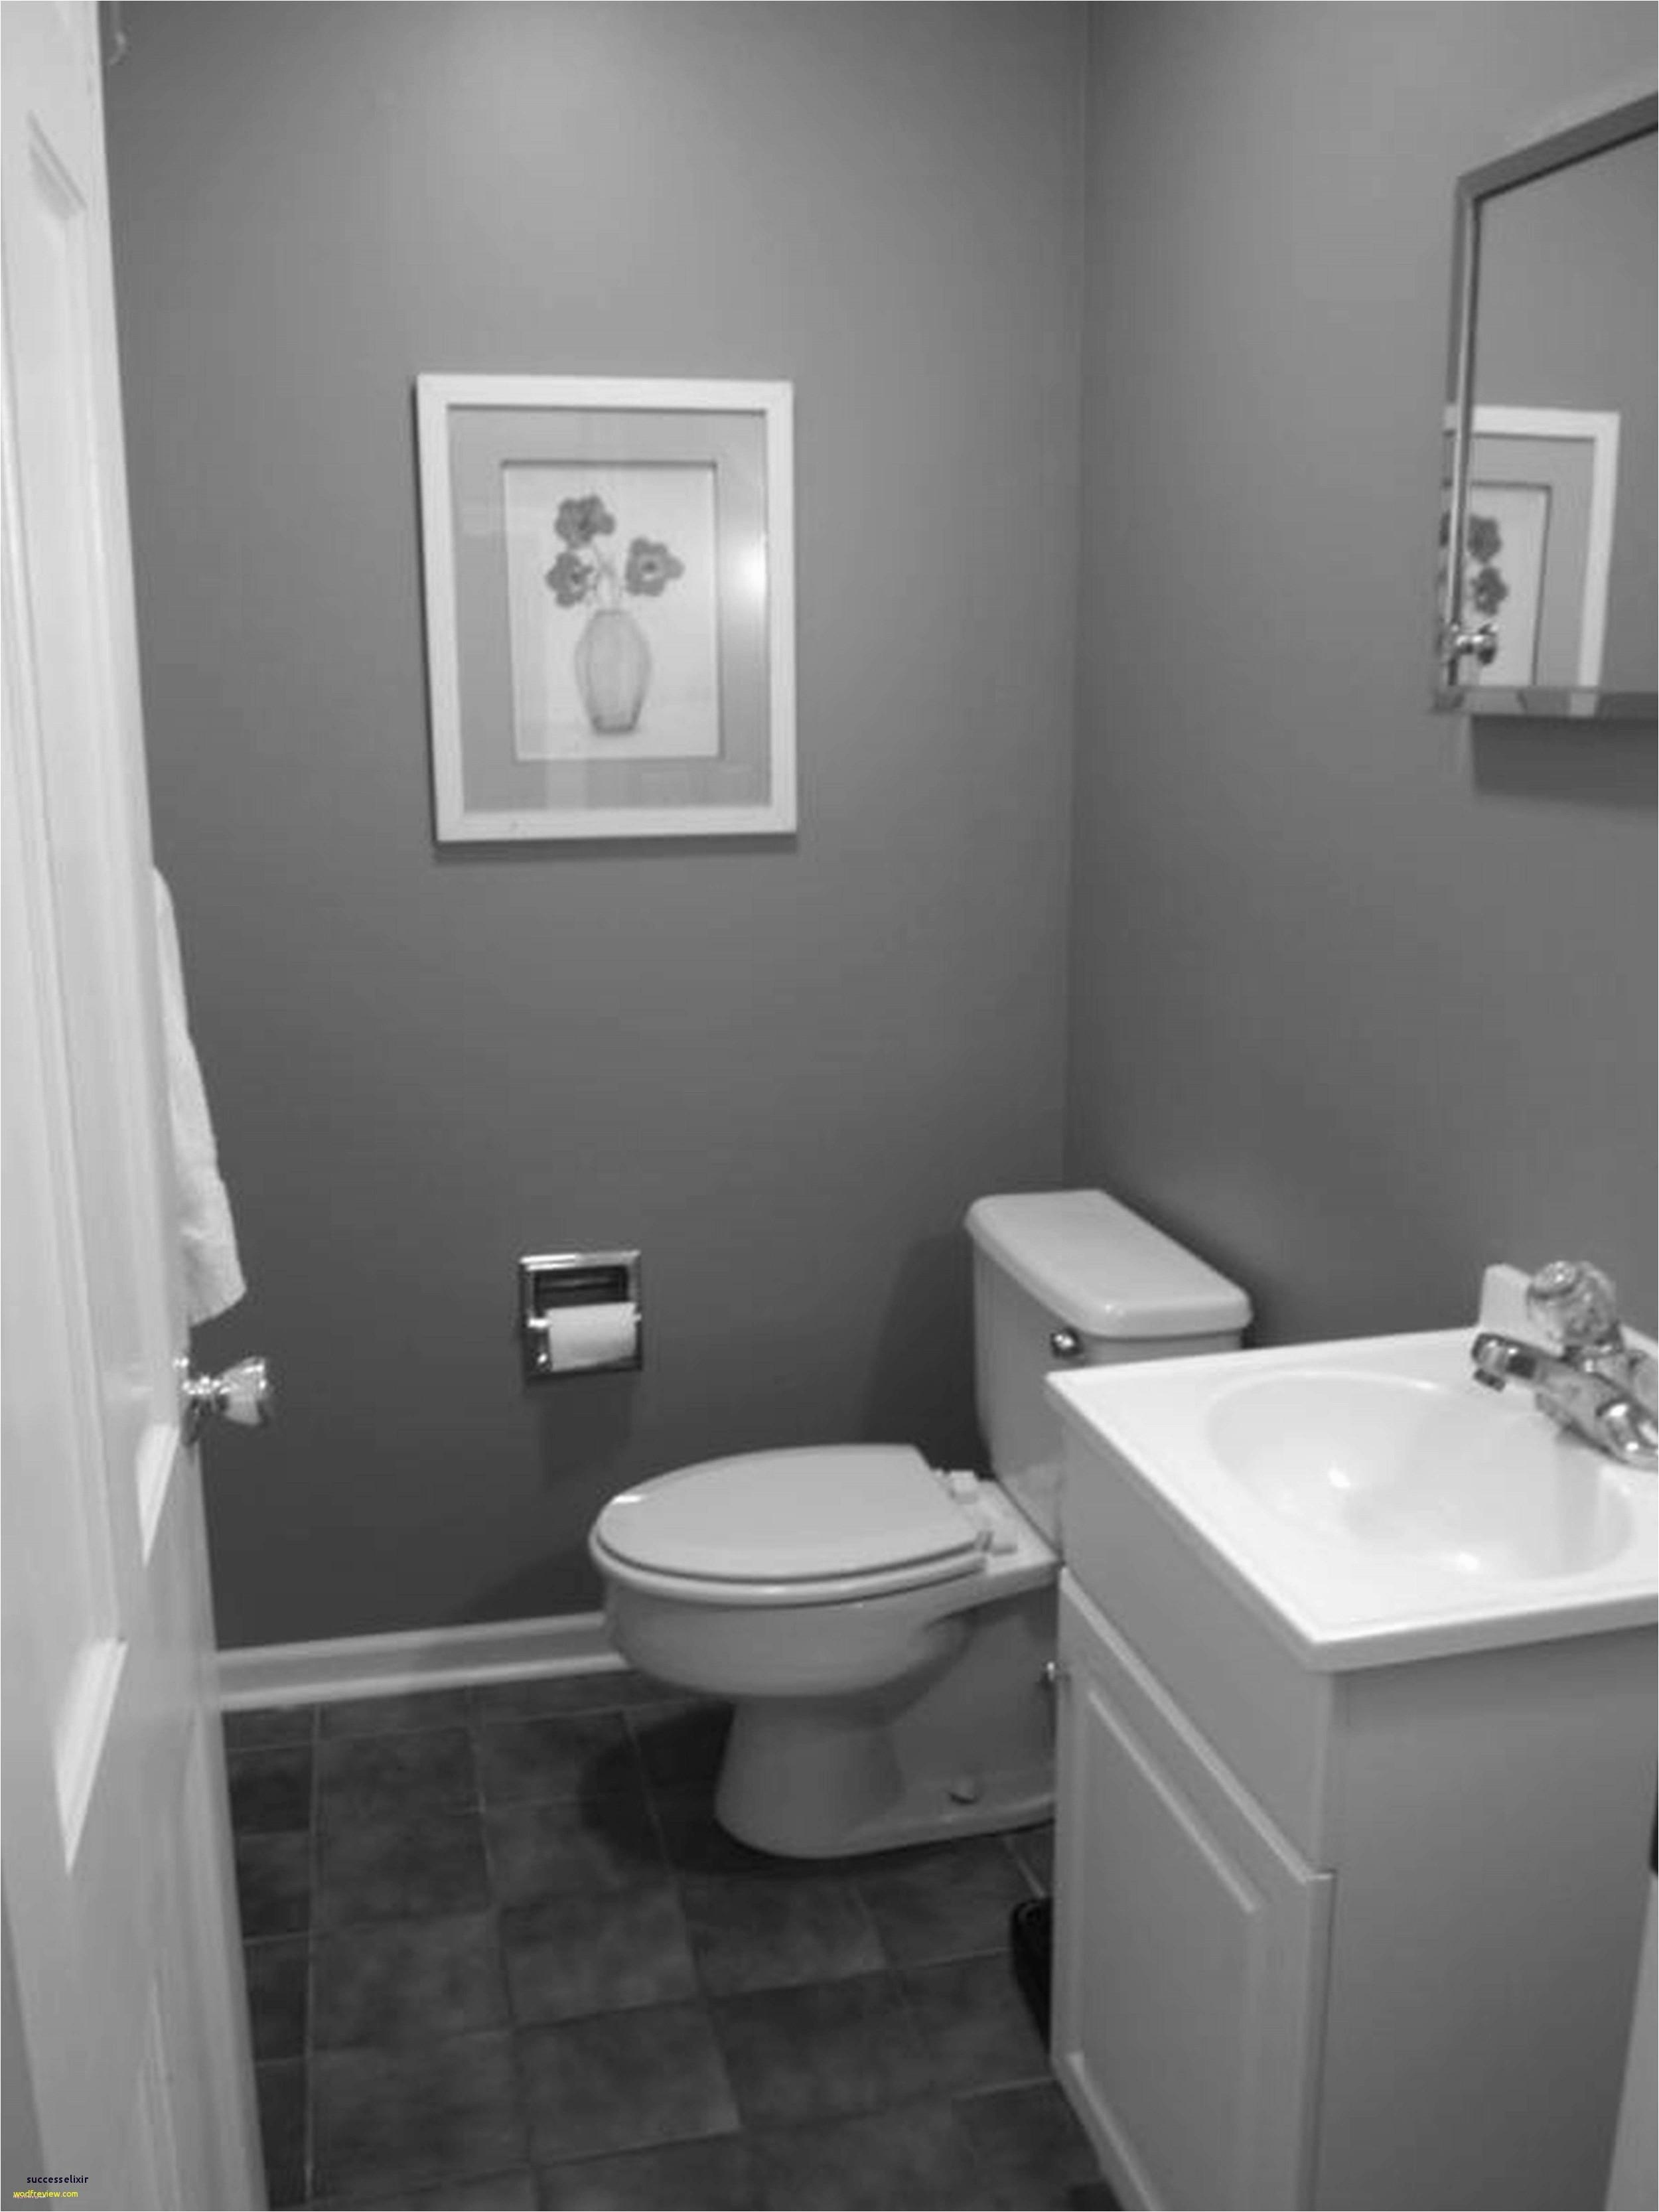 diy shower walls beautiful fresh shower wall light onlinecheappandora diy shower walls unique 34 top grey bathroom color schemes wallpaper